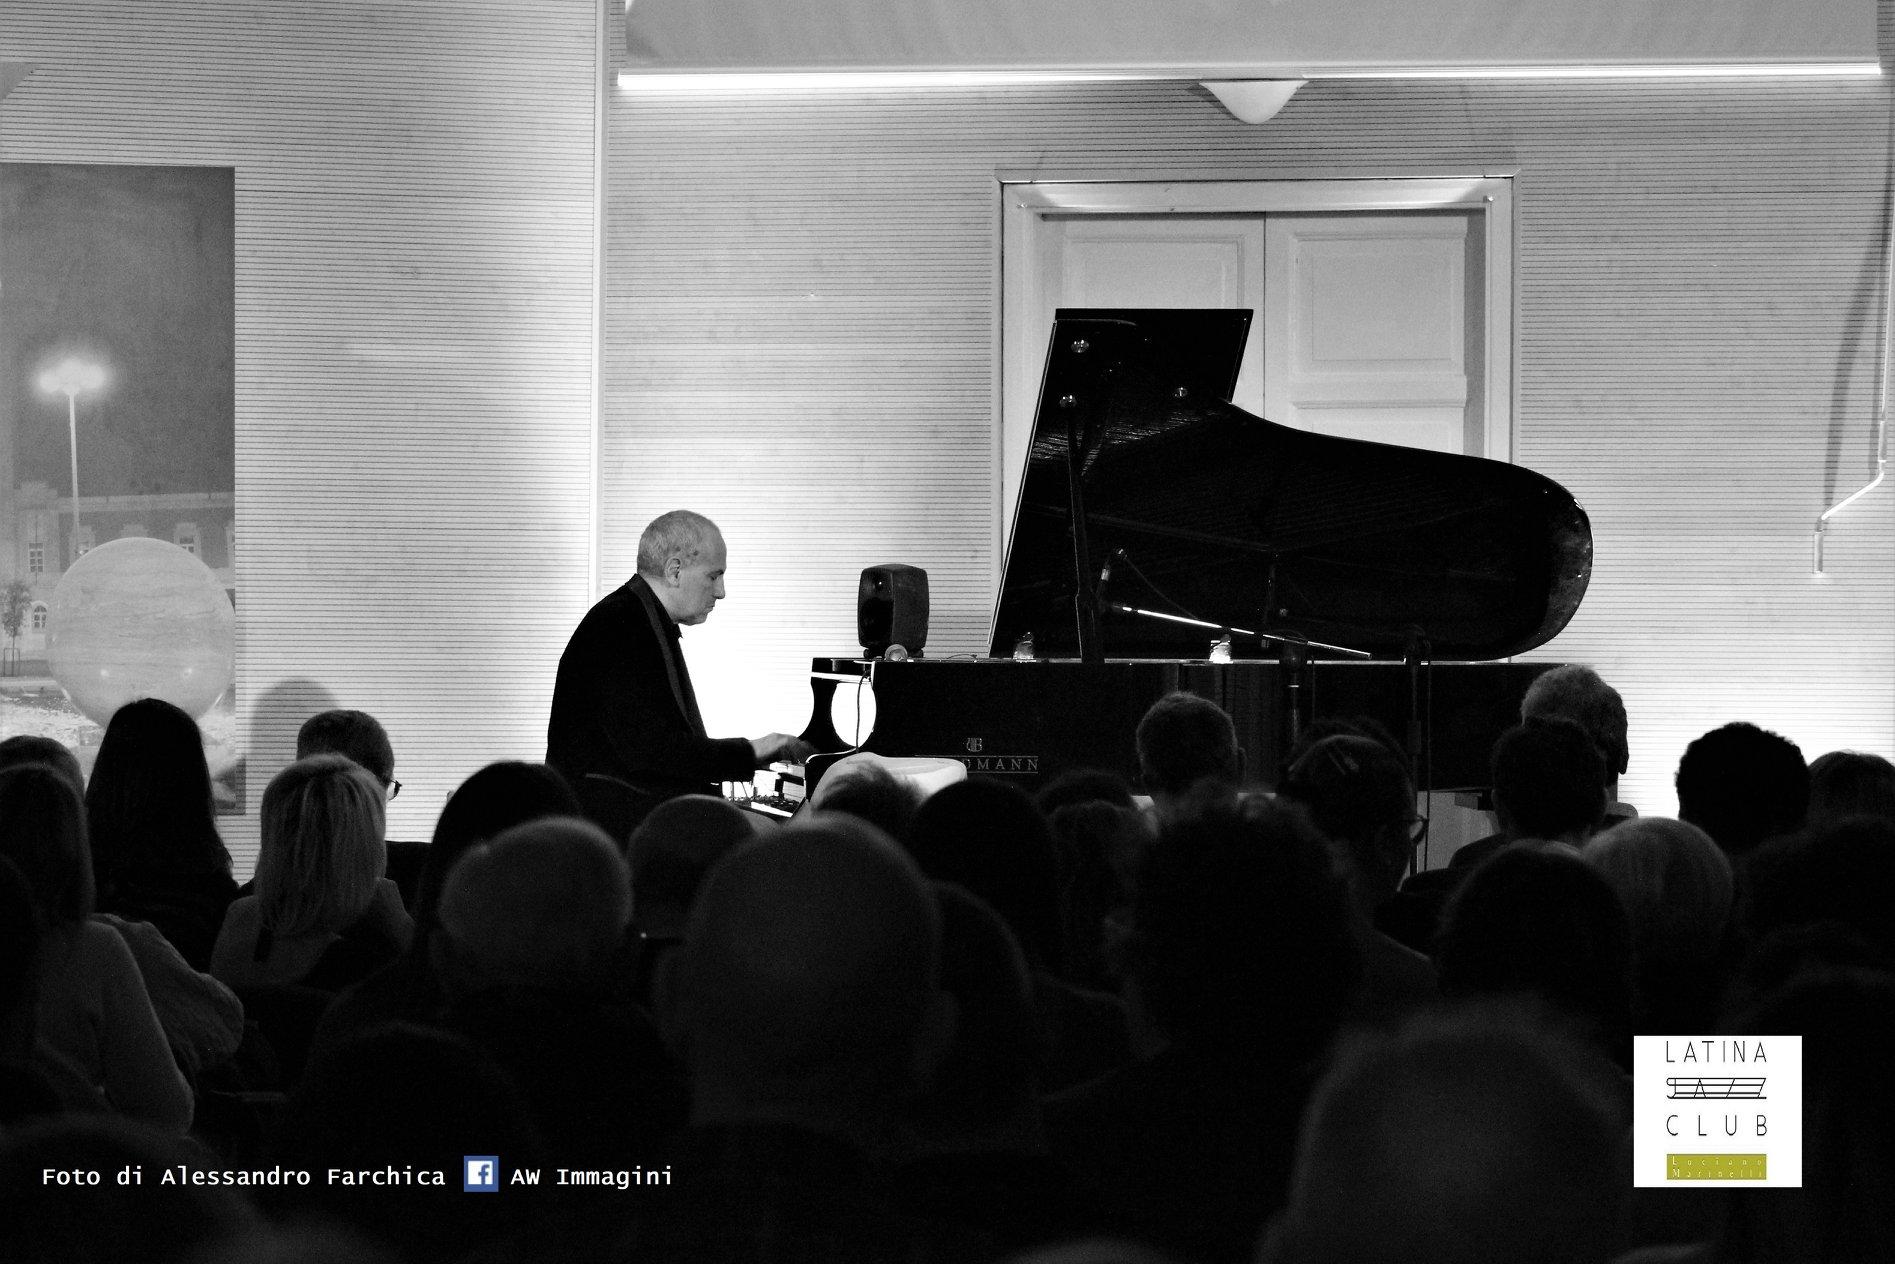 Latina Jazz Club ph. by Alessandro Farchica